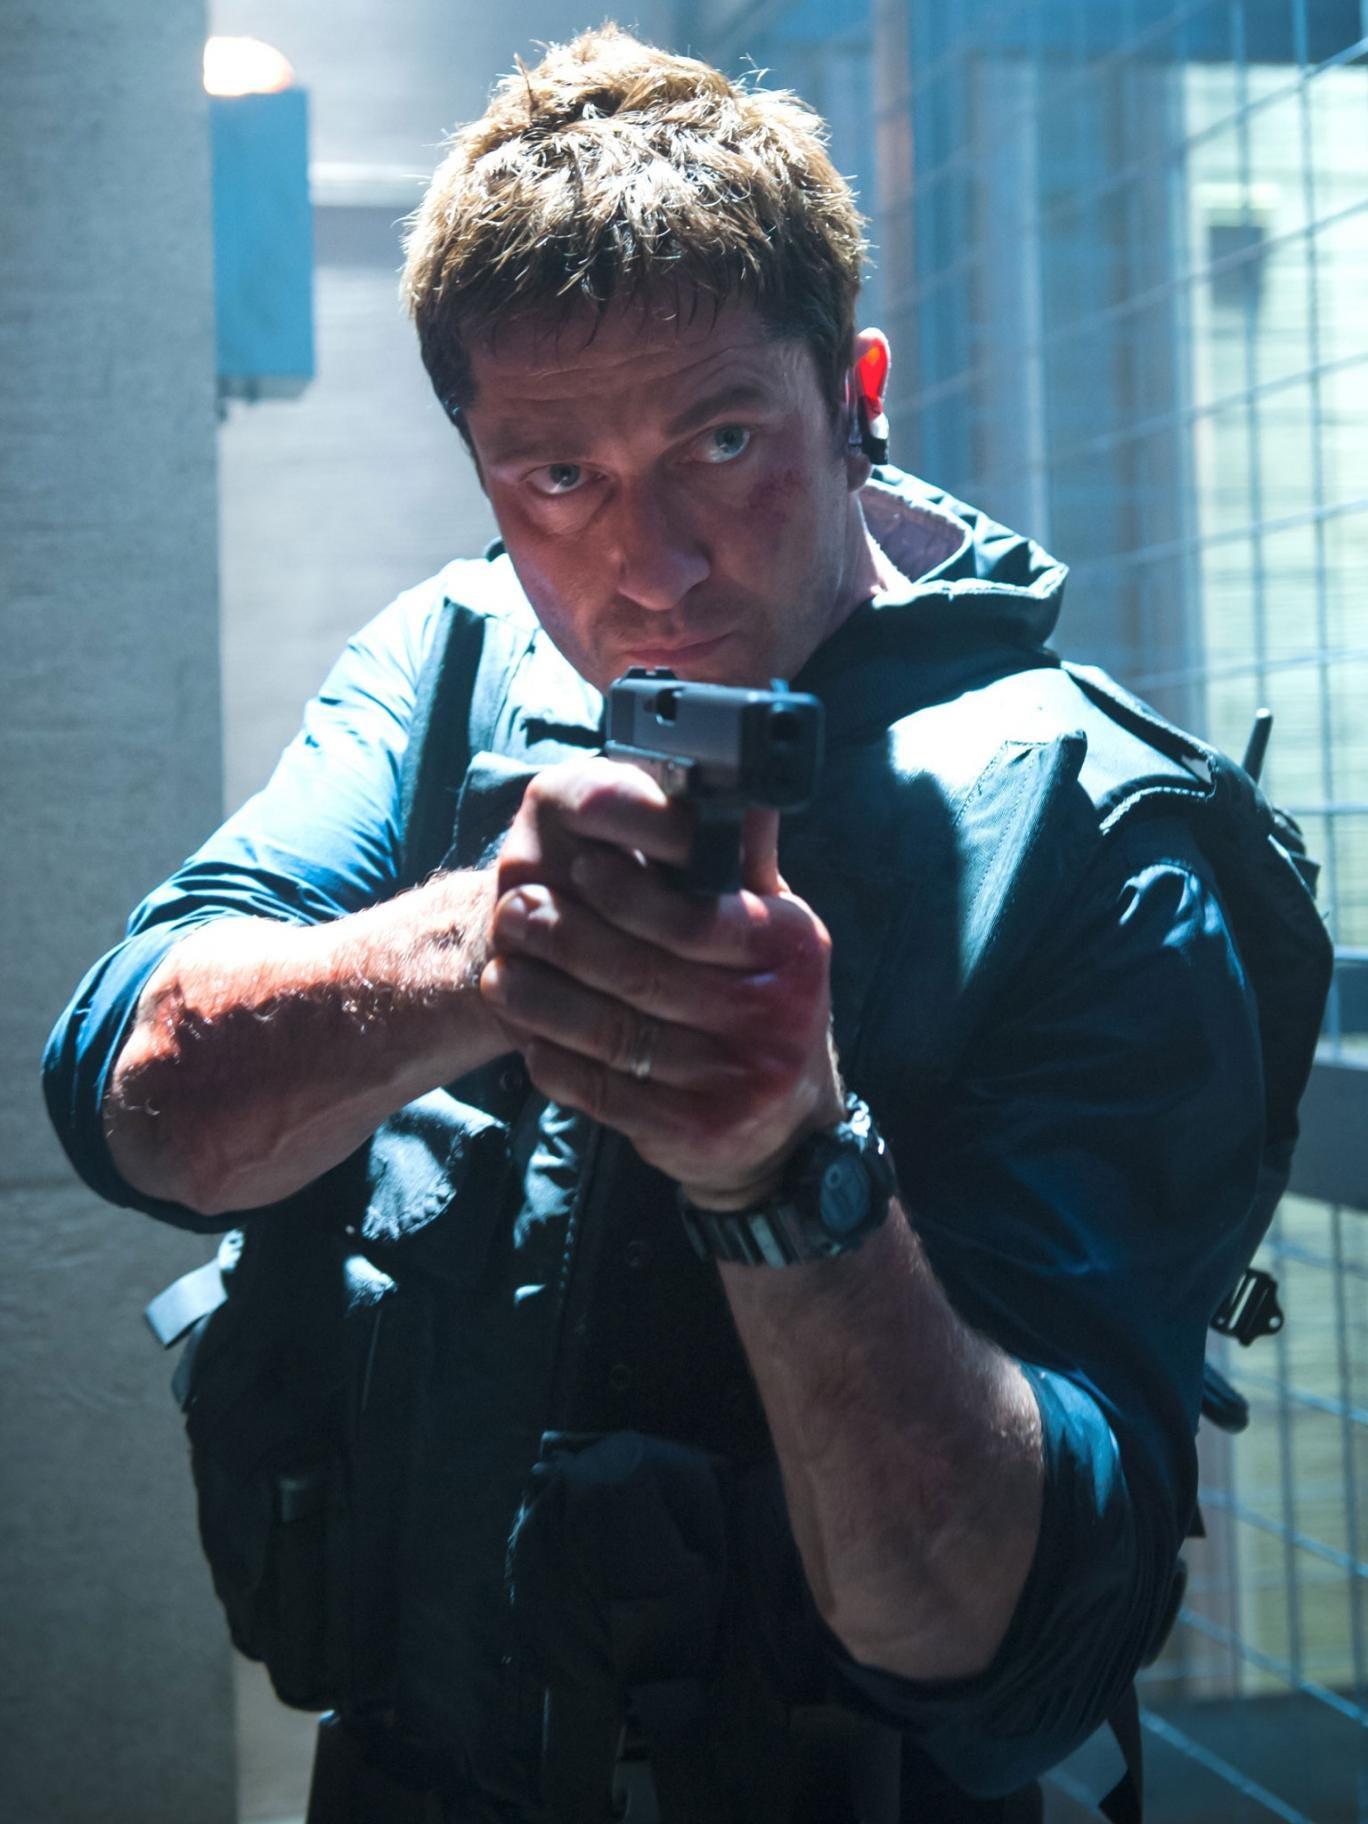 Patriot lame: Gerard Butler misfires in 'Olympus Has Fallen'